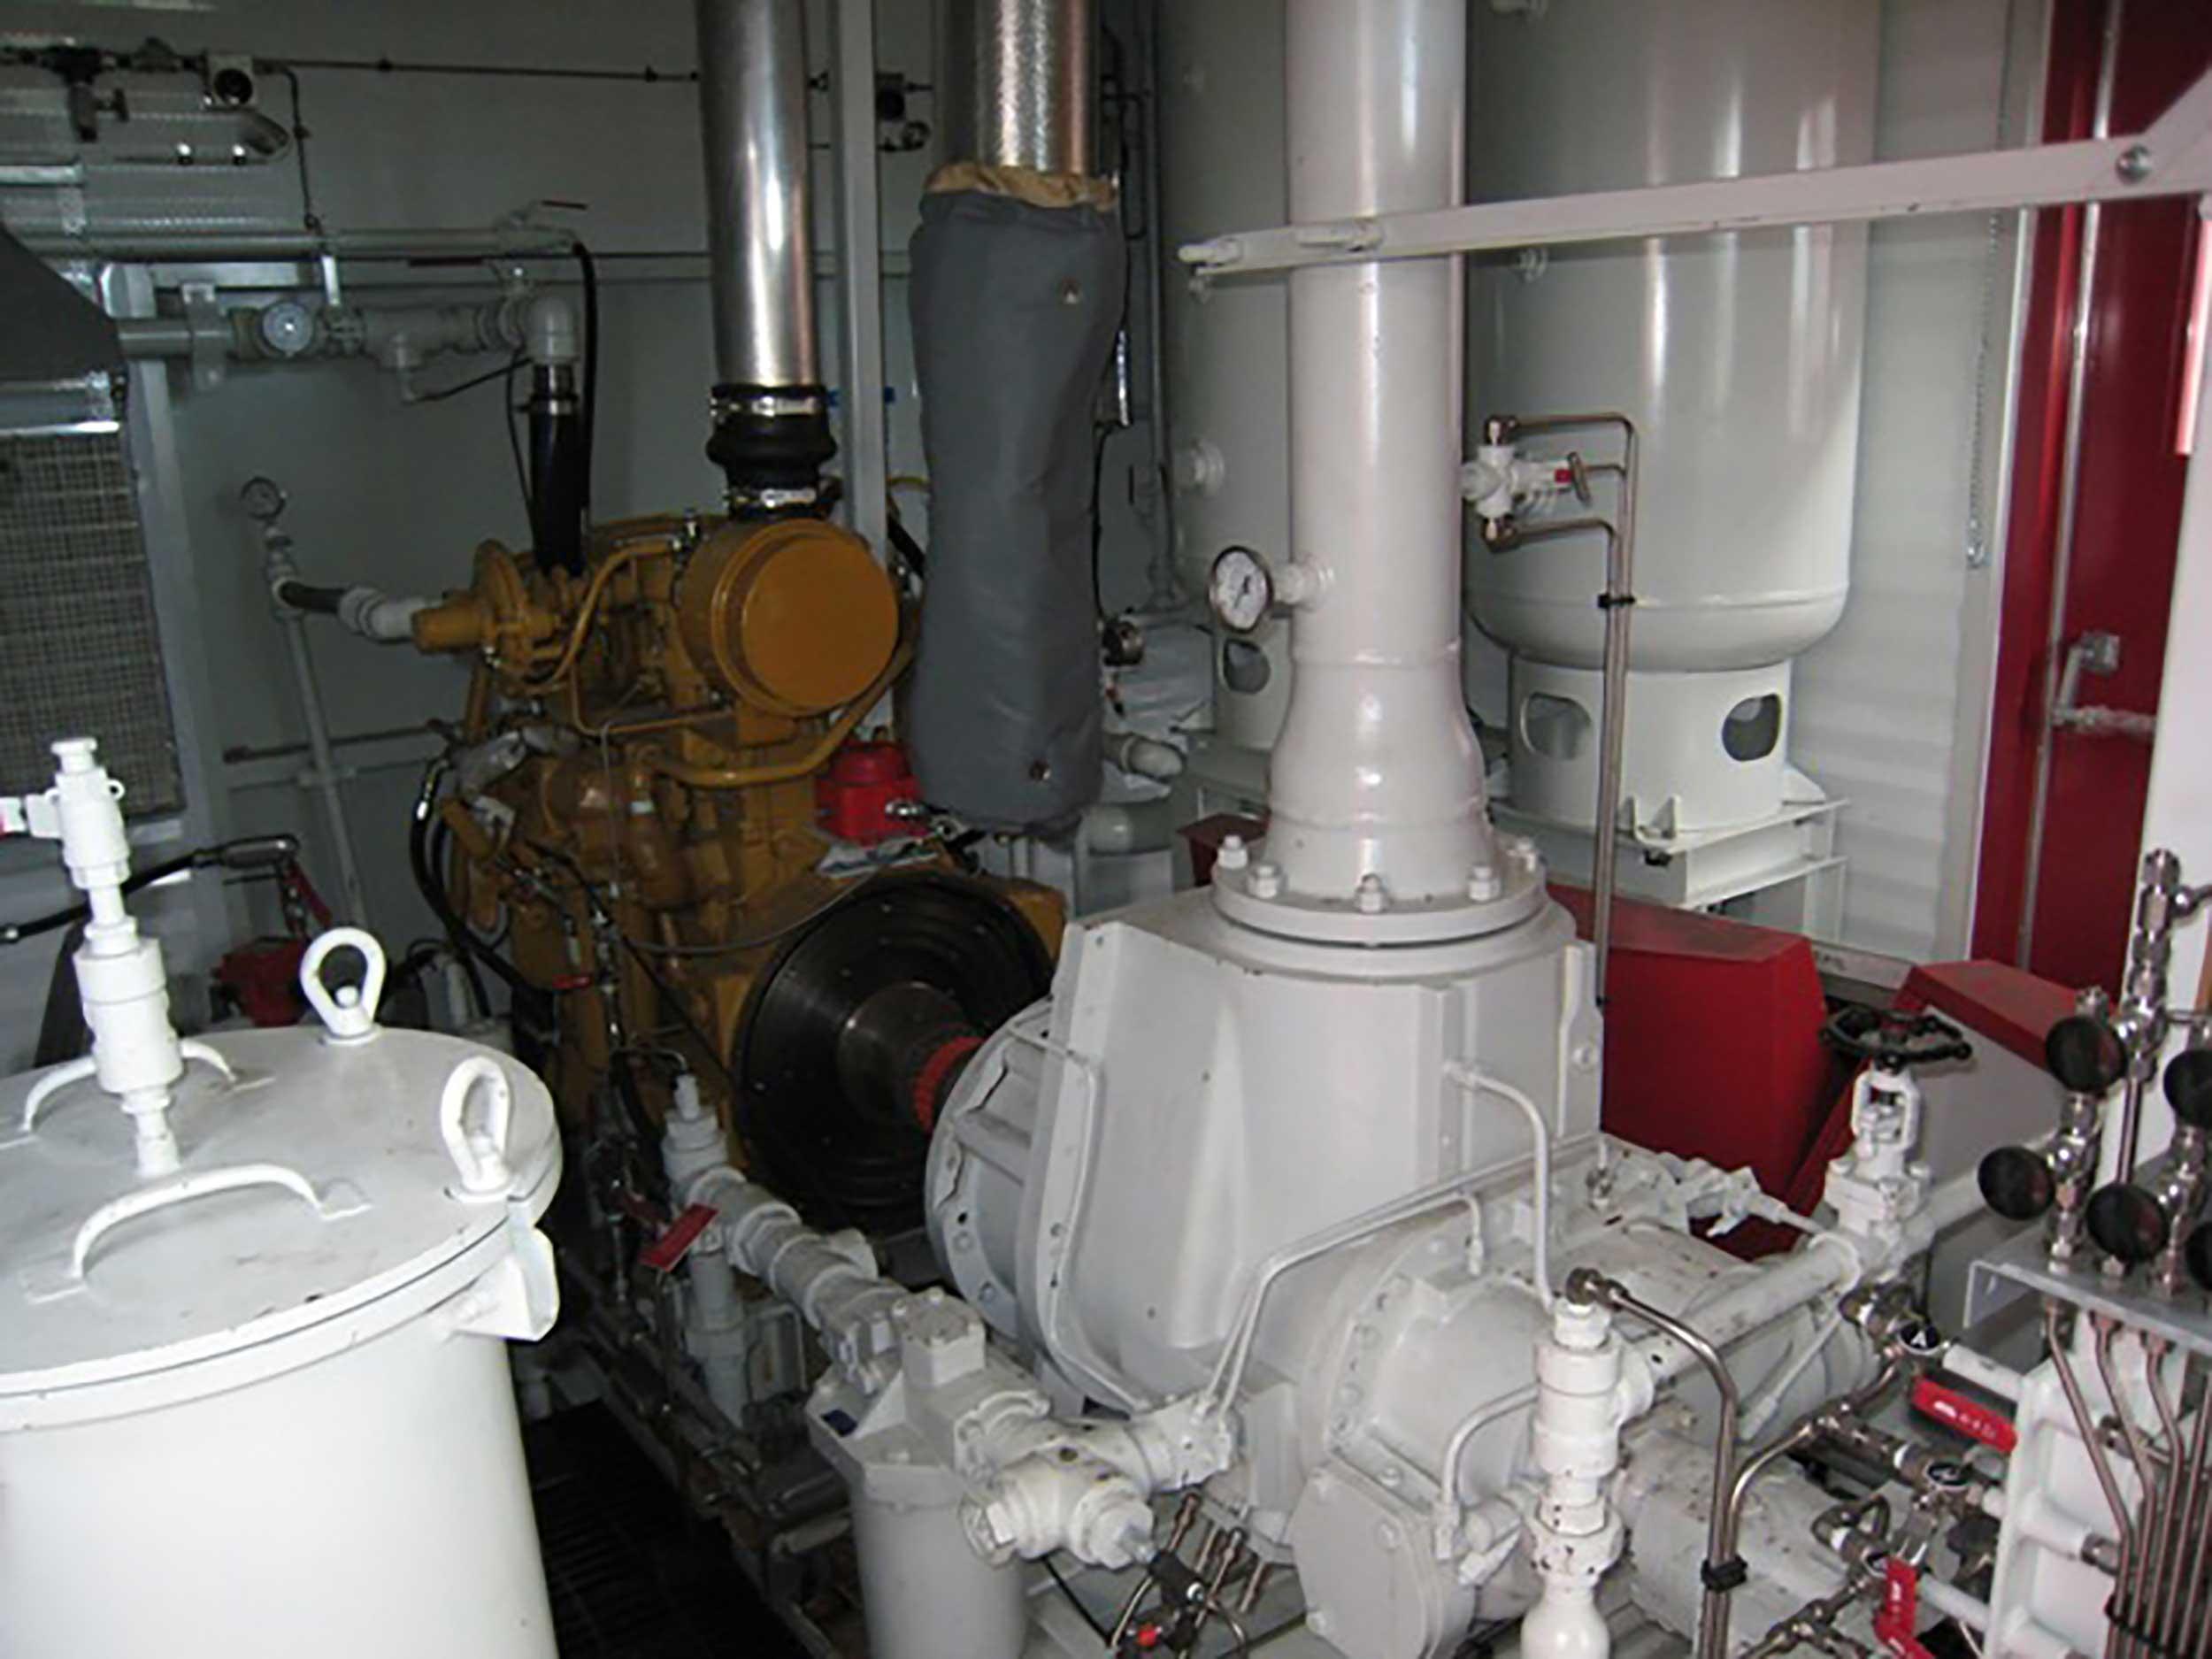 Interior 6 New / Never Used 95HP Caterpillar Vacuum Reciprocating Compressors For Sale in Alberta Canada